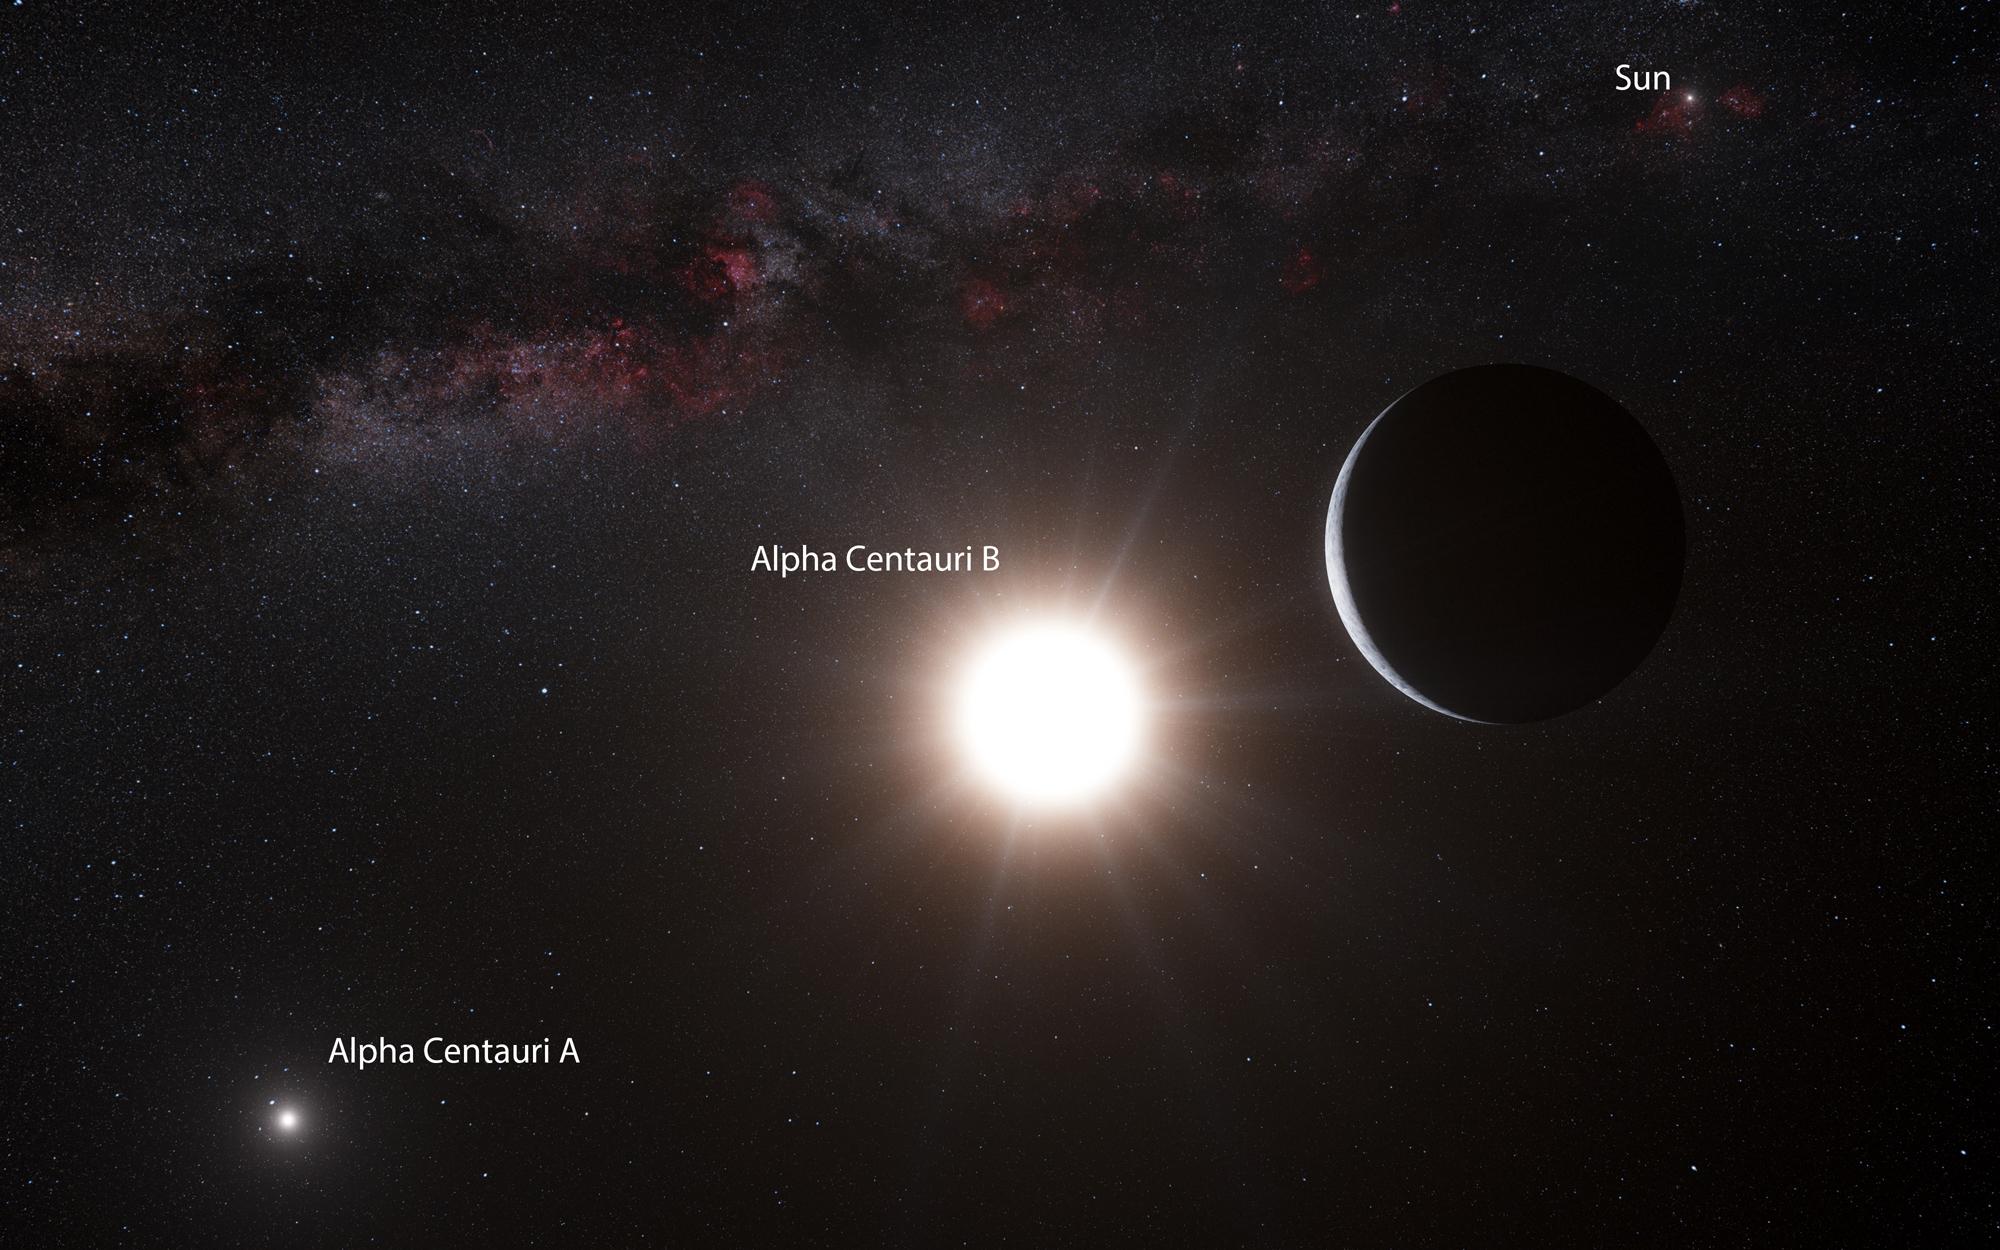 Всистеме Альфа Центавра найдена планета земного типа